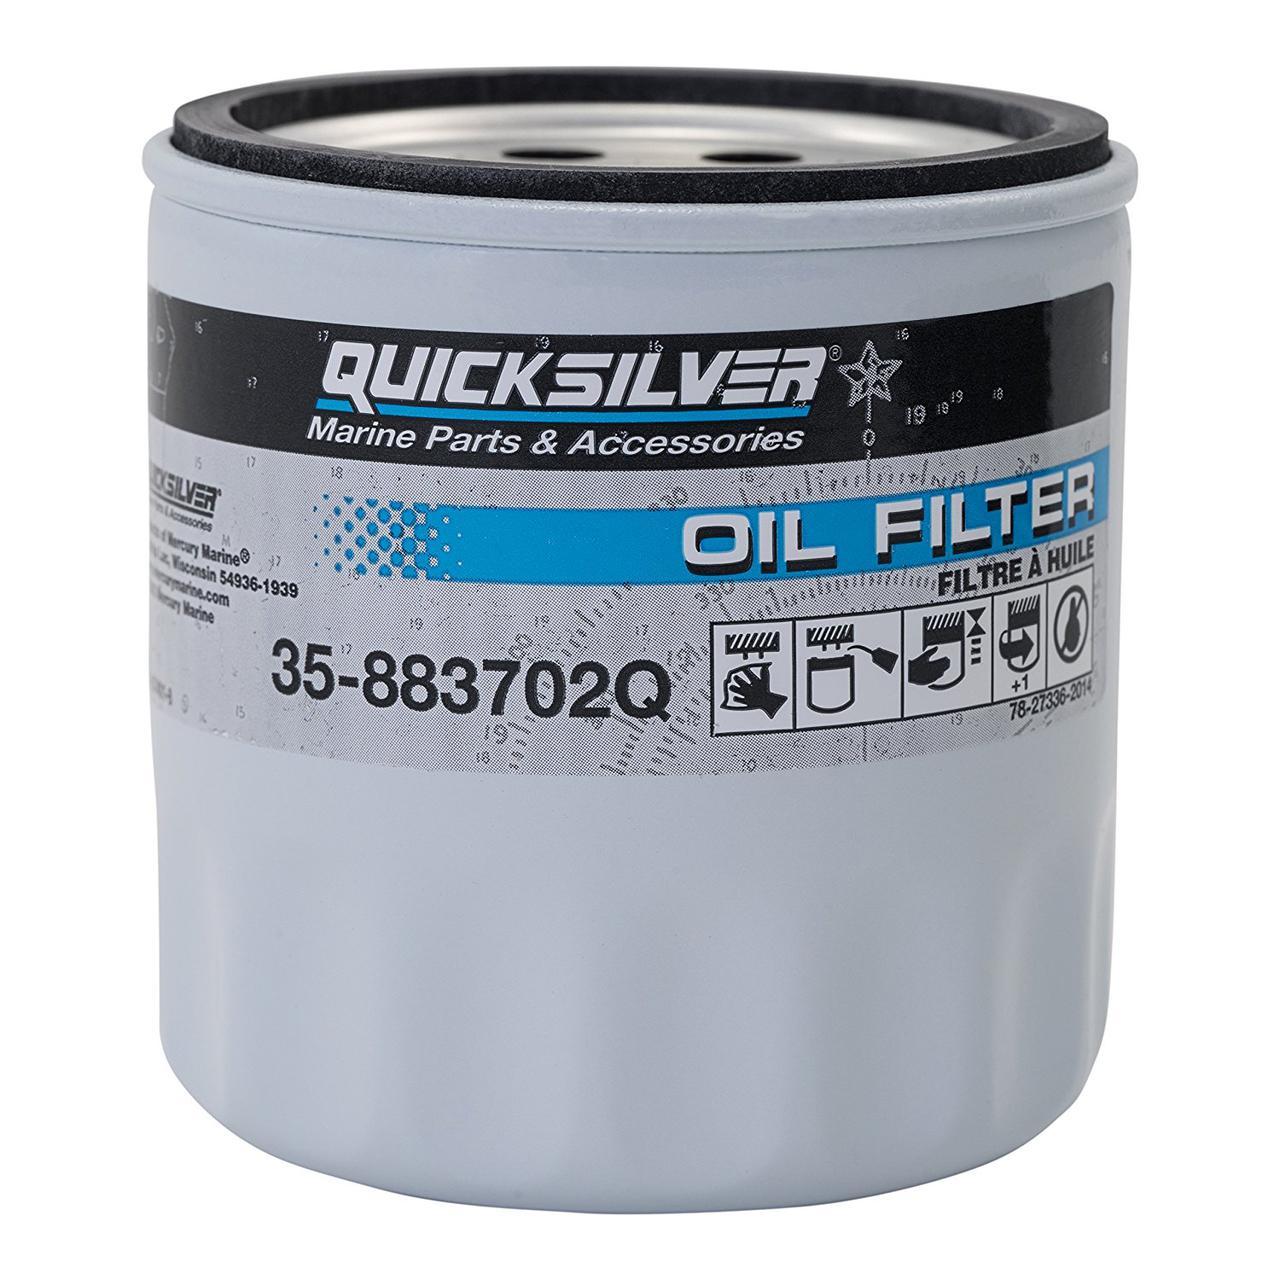 Фильтр масляный для Mercruiser MCM V-6 4.3L